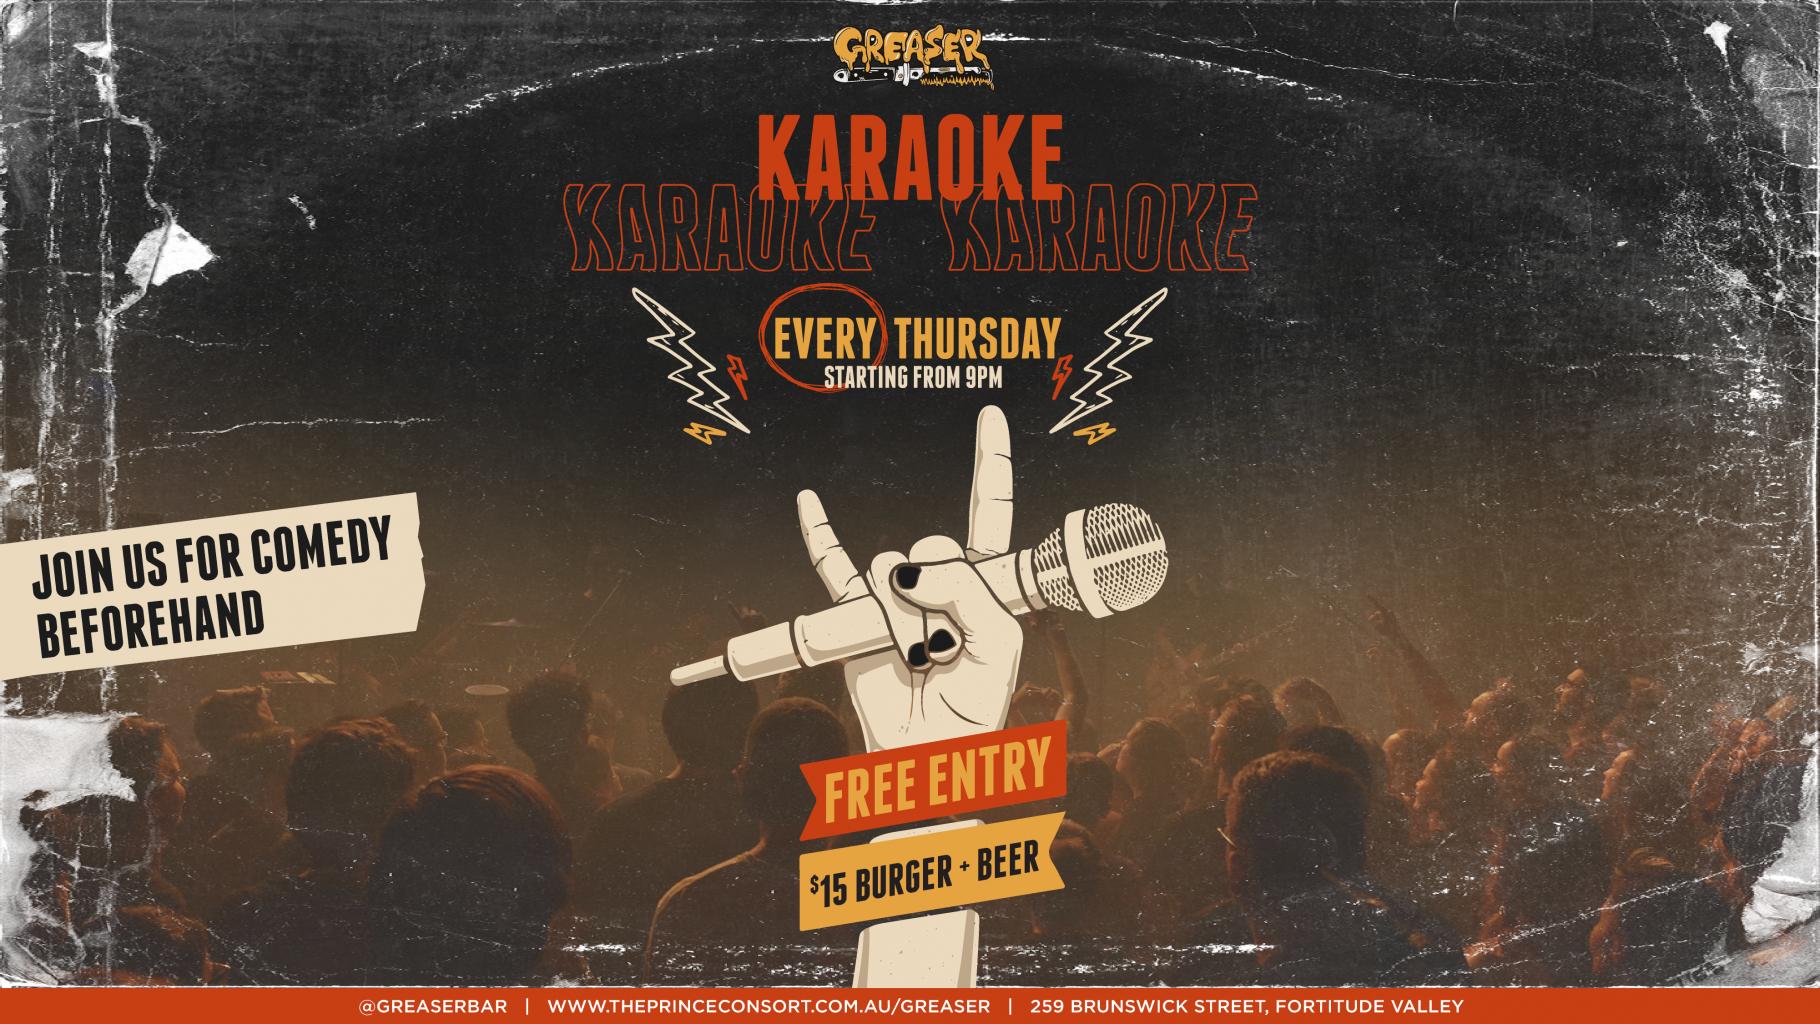 Karaoke at Greaser every Thursday